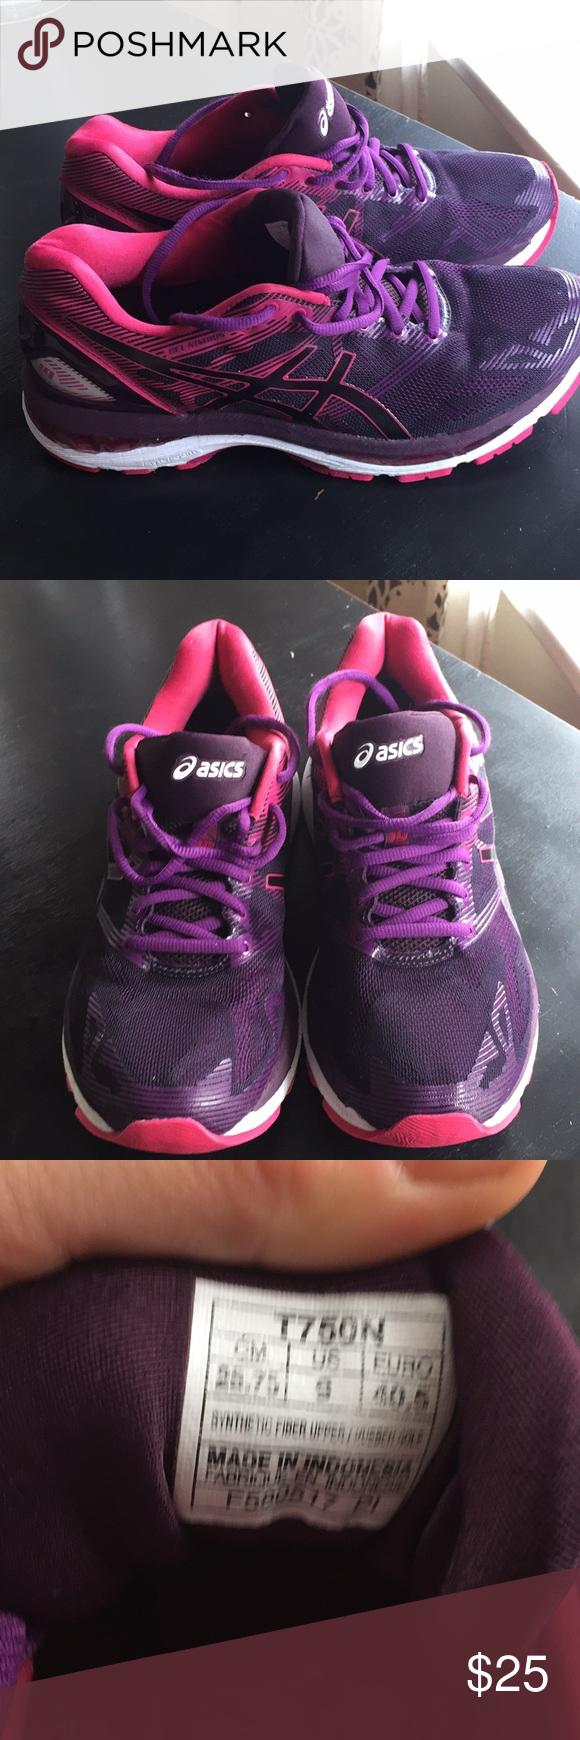 pink and purple asics